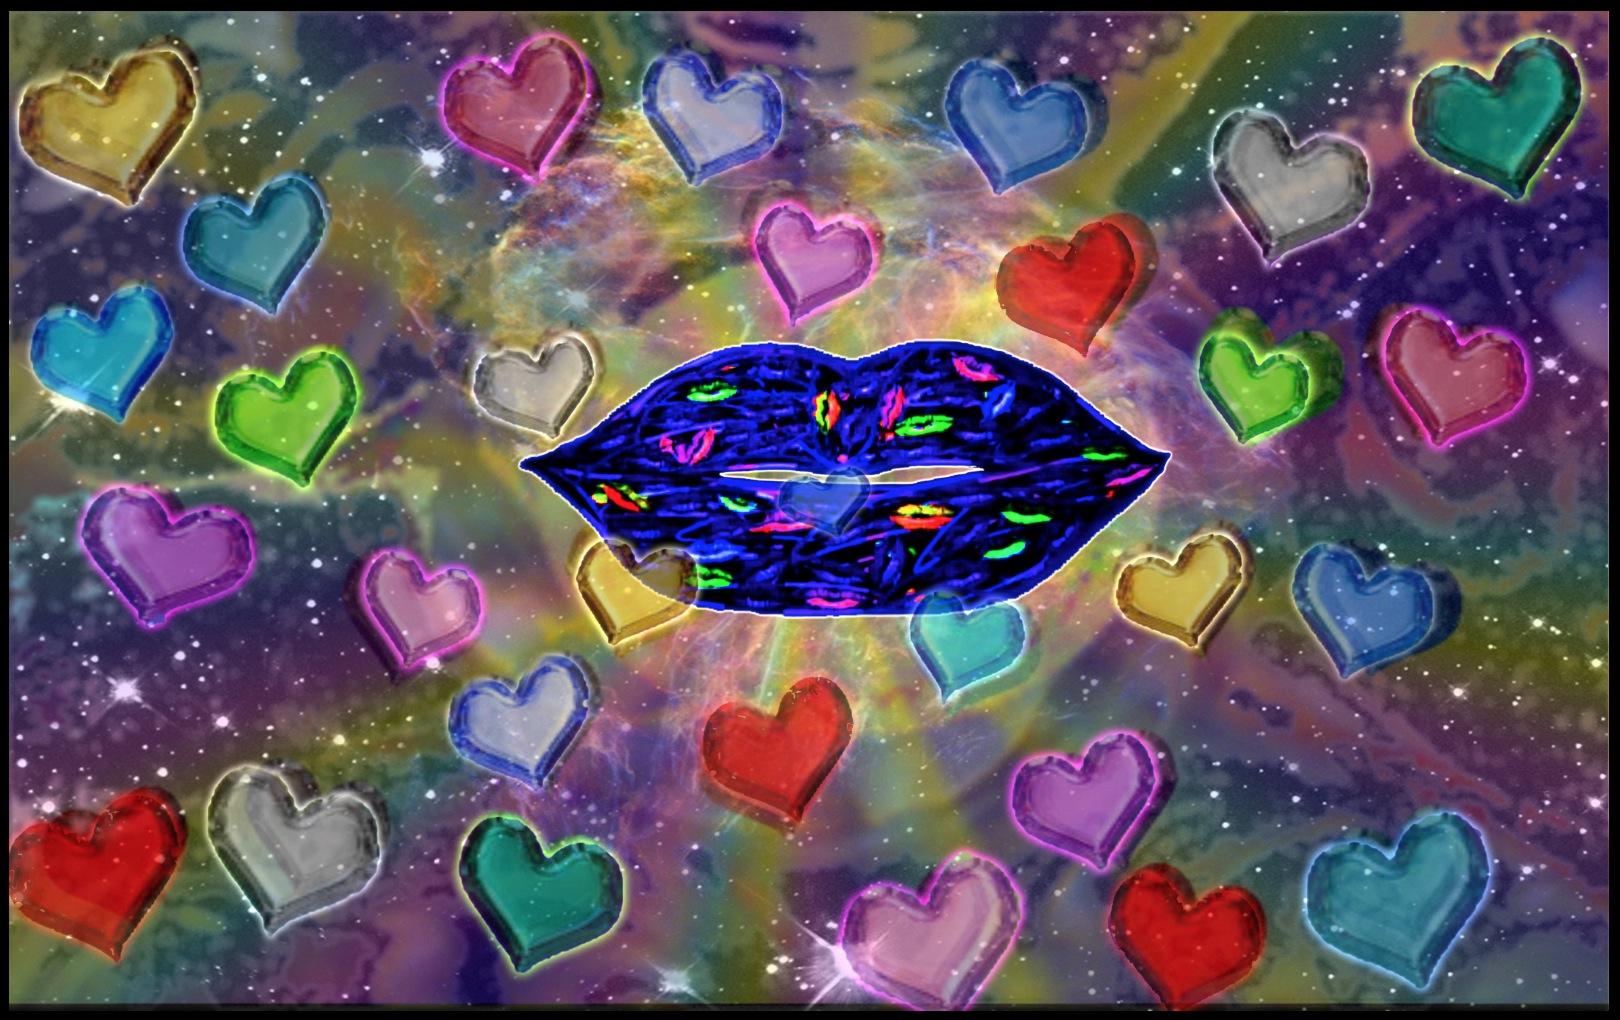 Speak of Love - Sterling Love